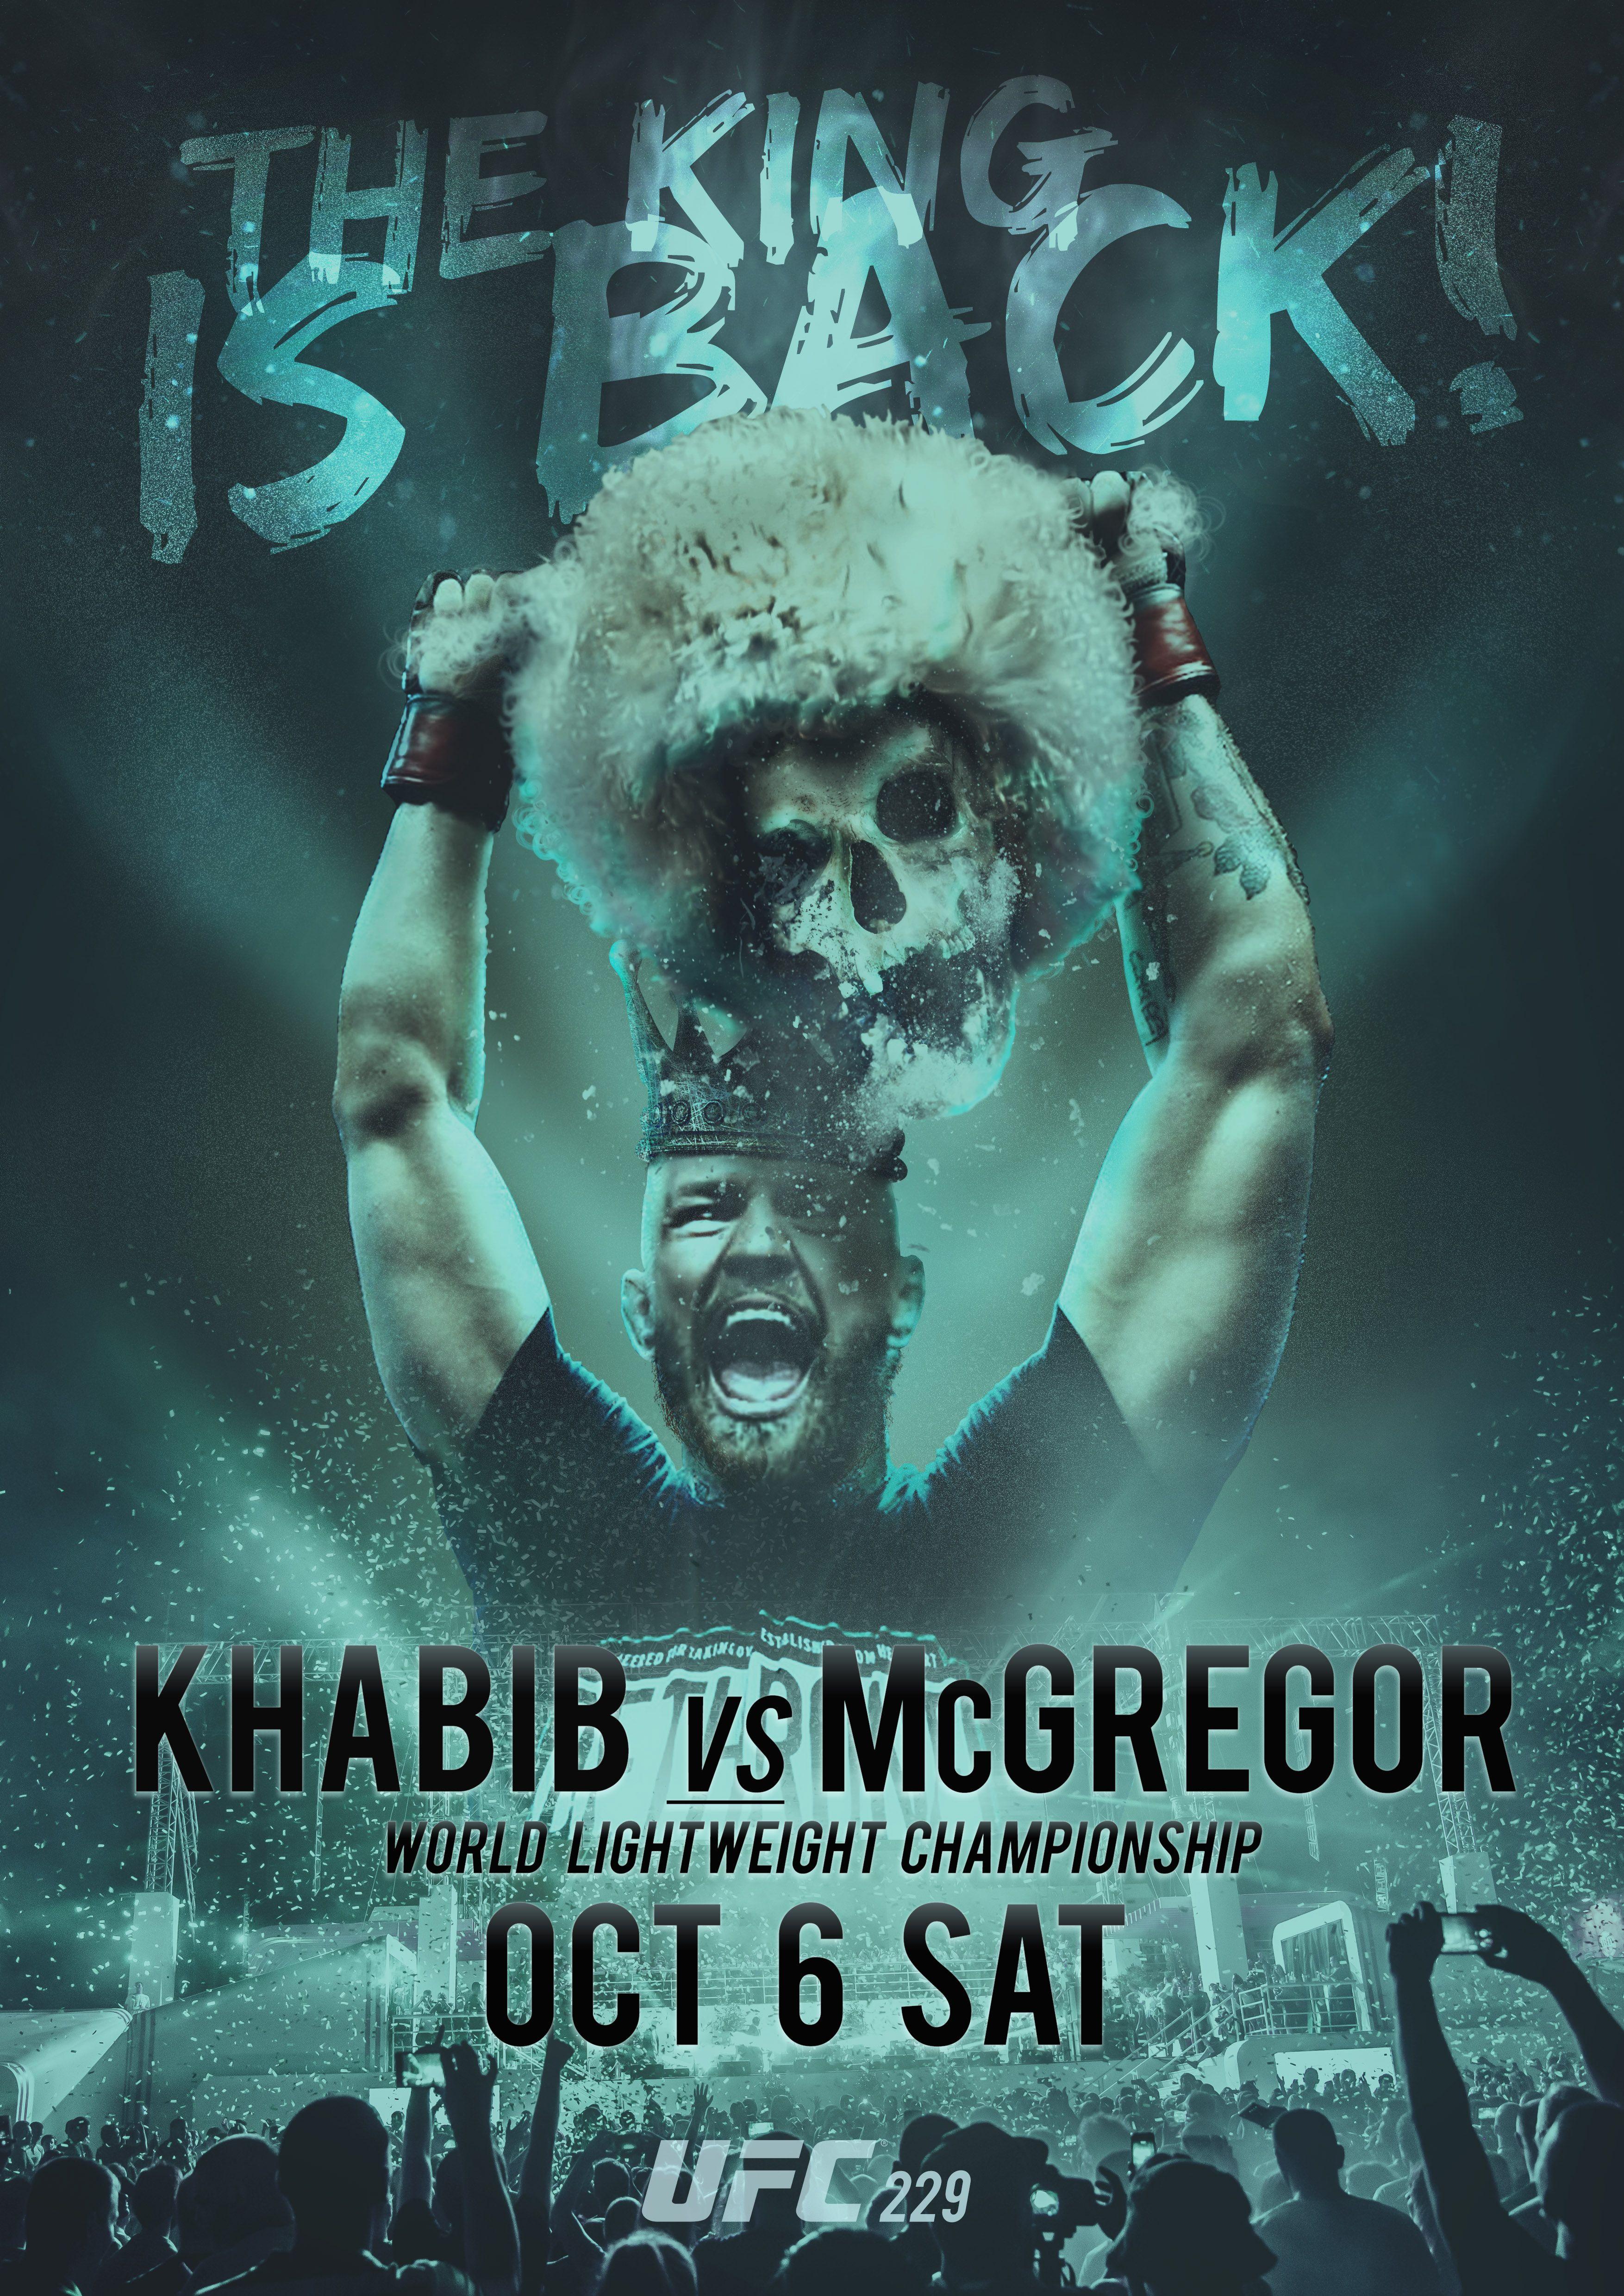 McGregor vs Khabib UFC Ufc conor mcgregor Connor mcgregor 3508x4961